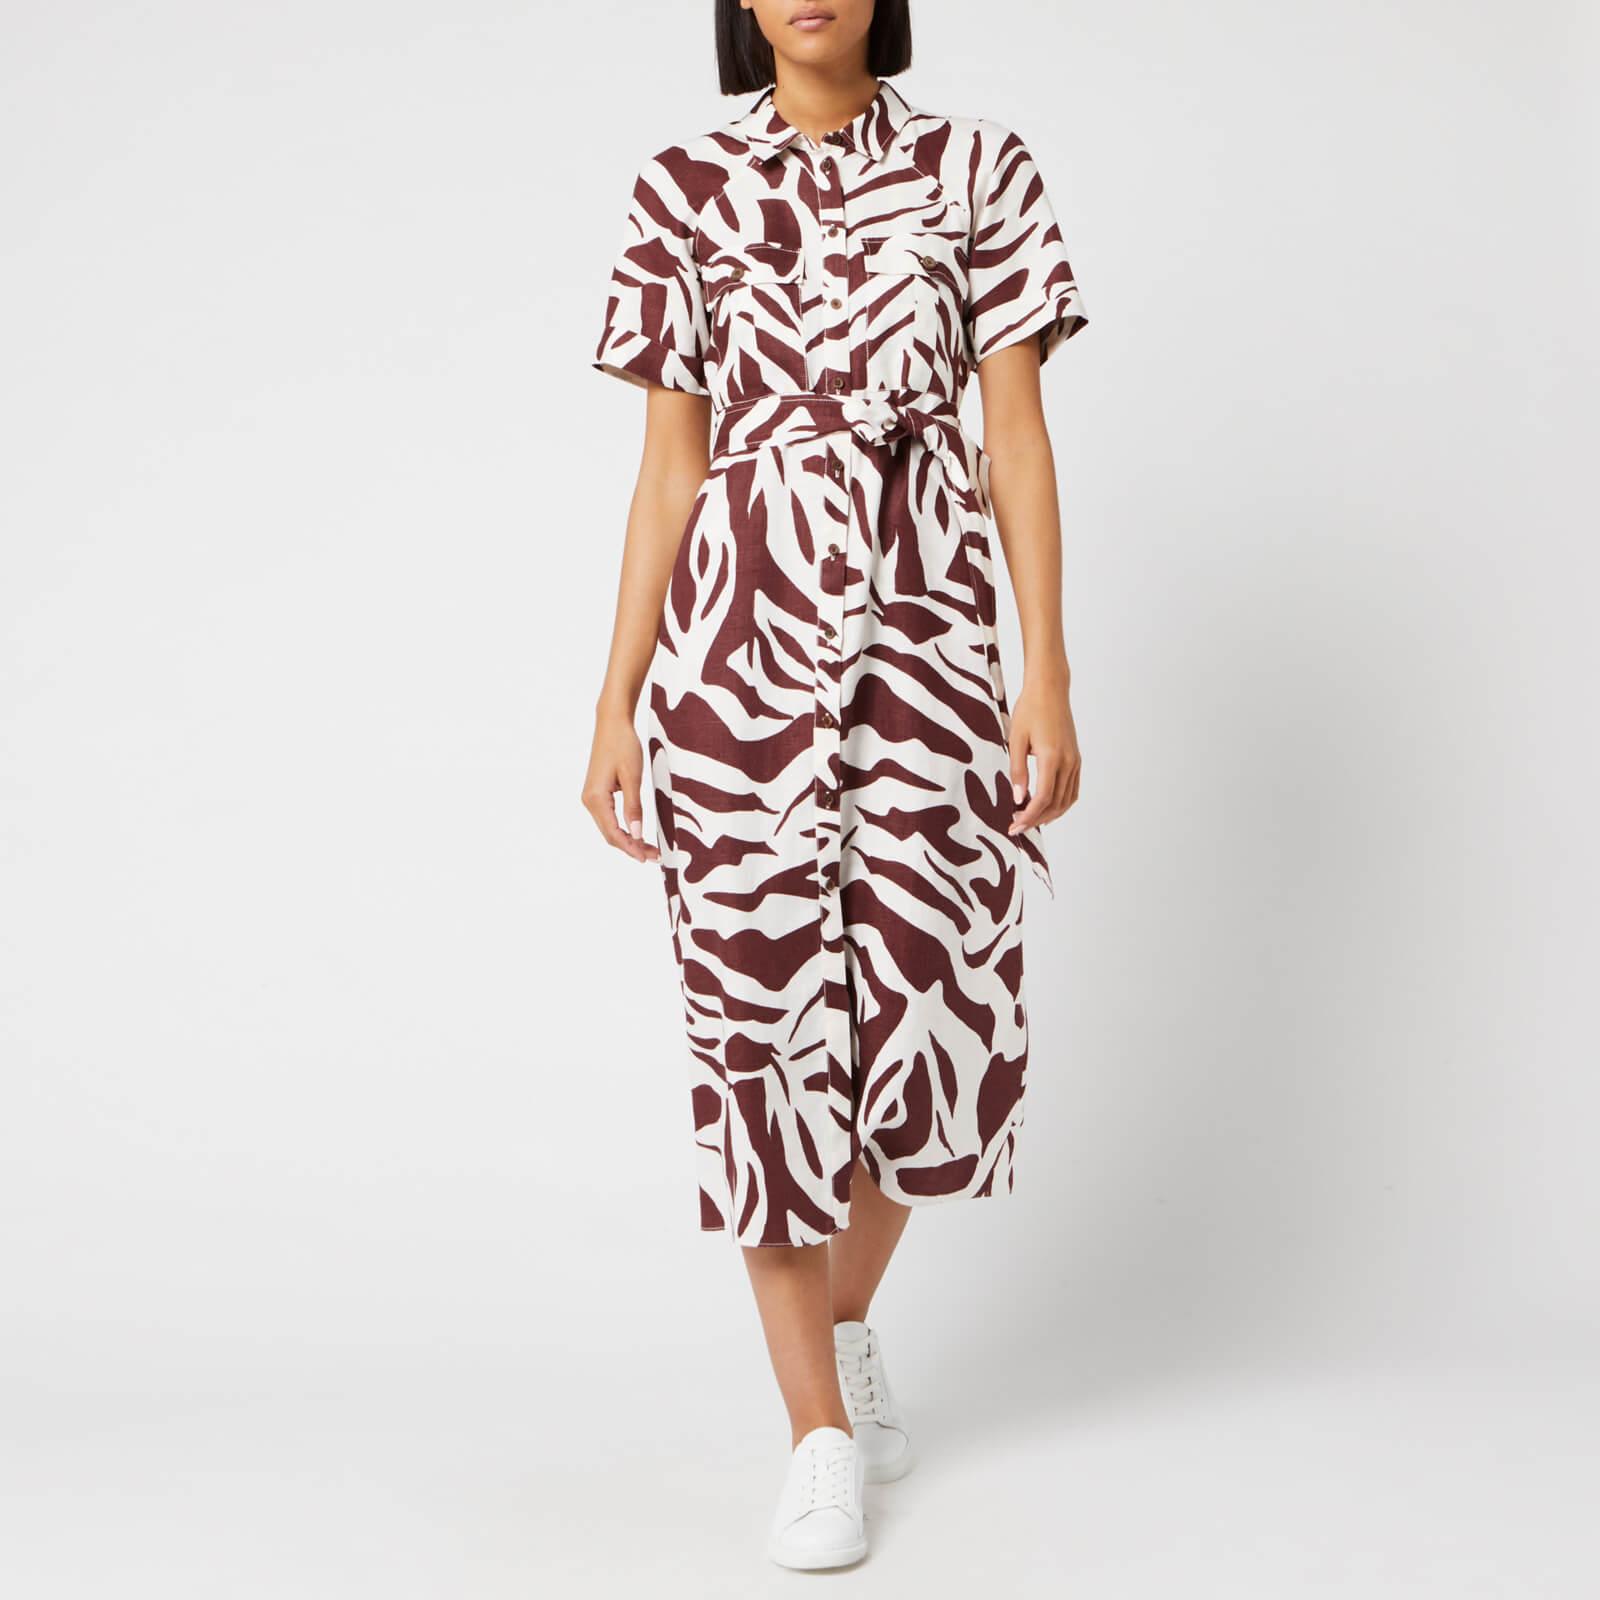 Whistles Women's Graphic Zebra Shirt Dress - Brown/Multi - UK 6 - Multi